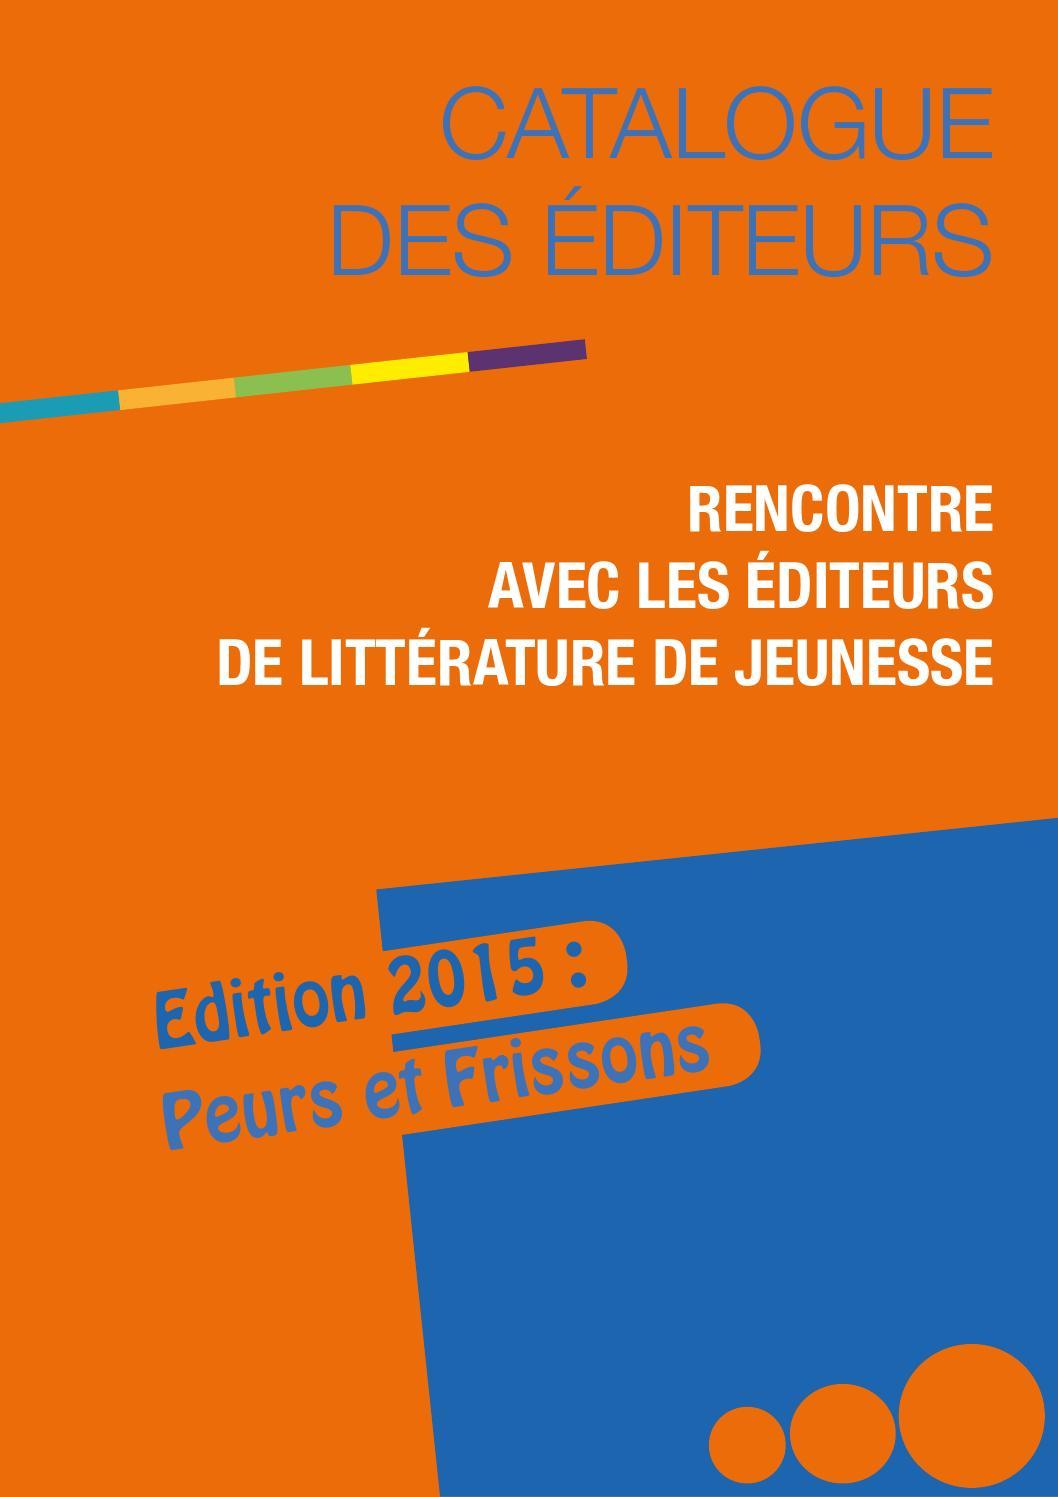 catalogue rencontres 2015 by deslivrespourlajeunesse issuu. Black Bedroom Furniture Sets. Home Design Ideas